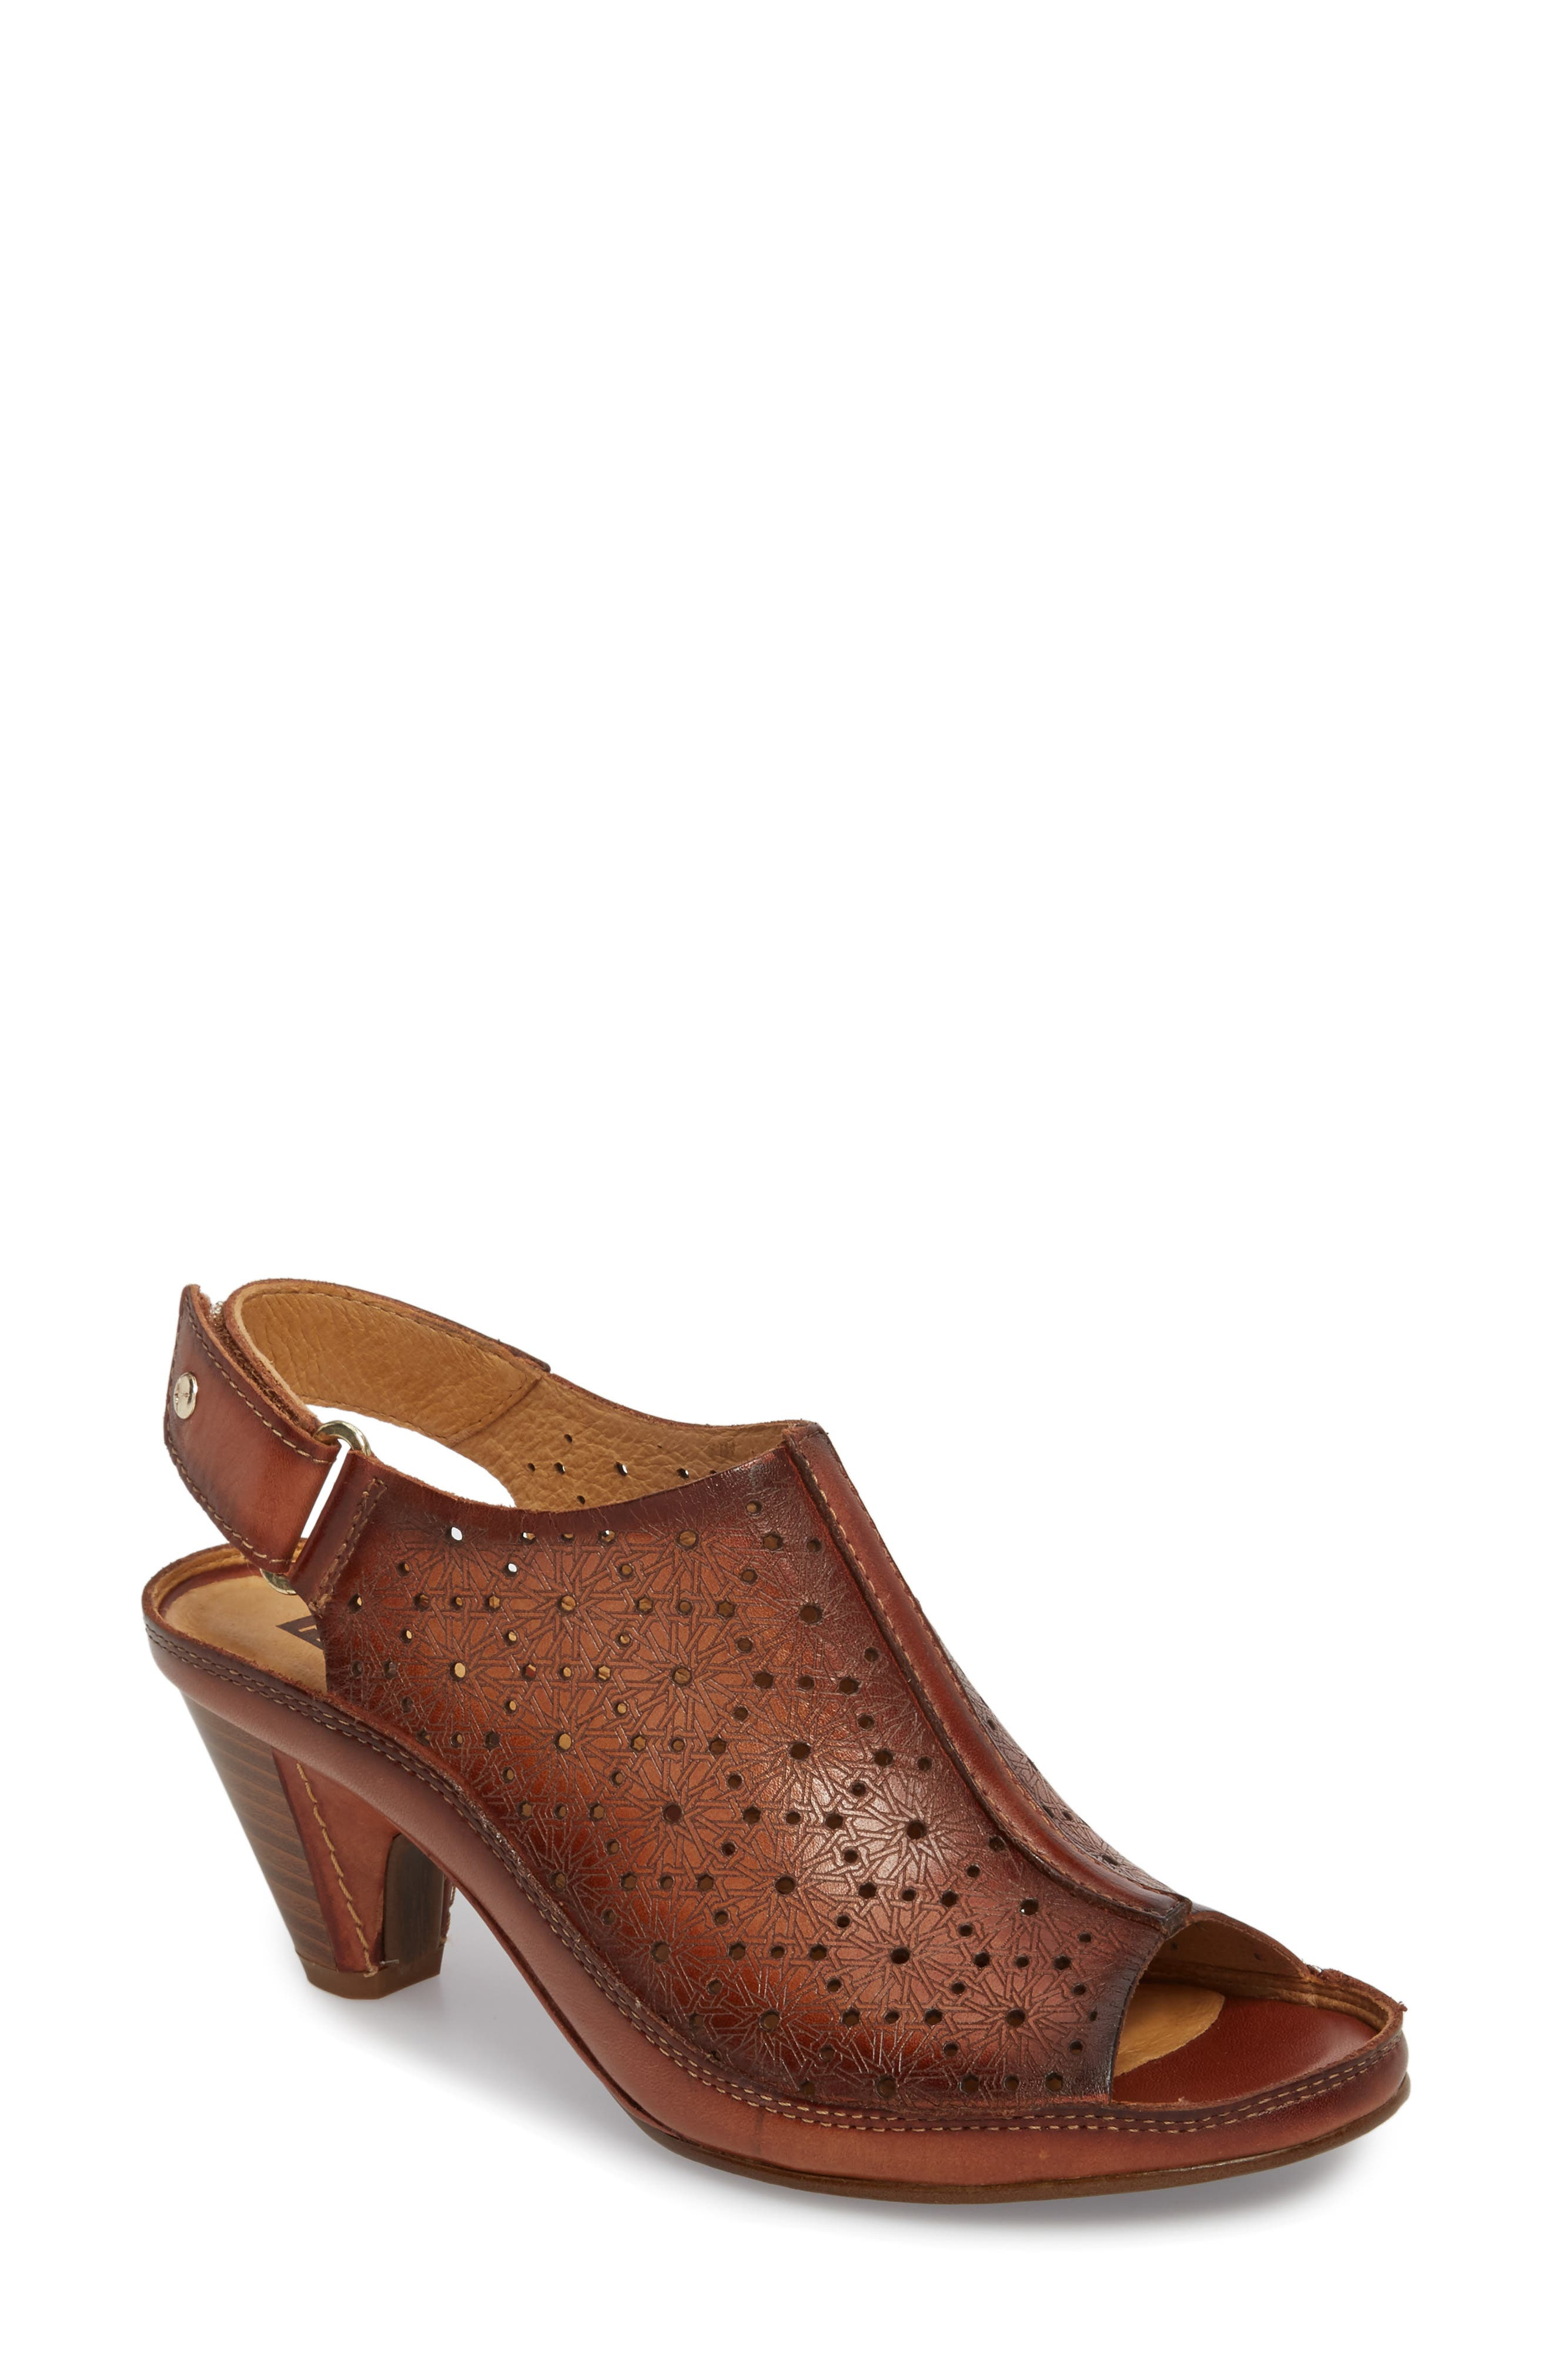 Pikolinos Java Sandal, Brown